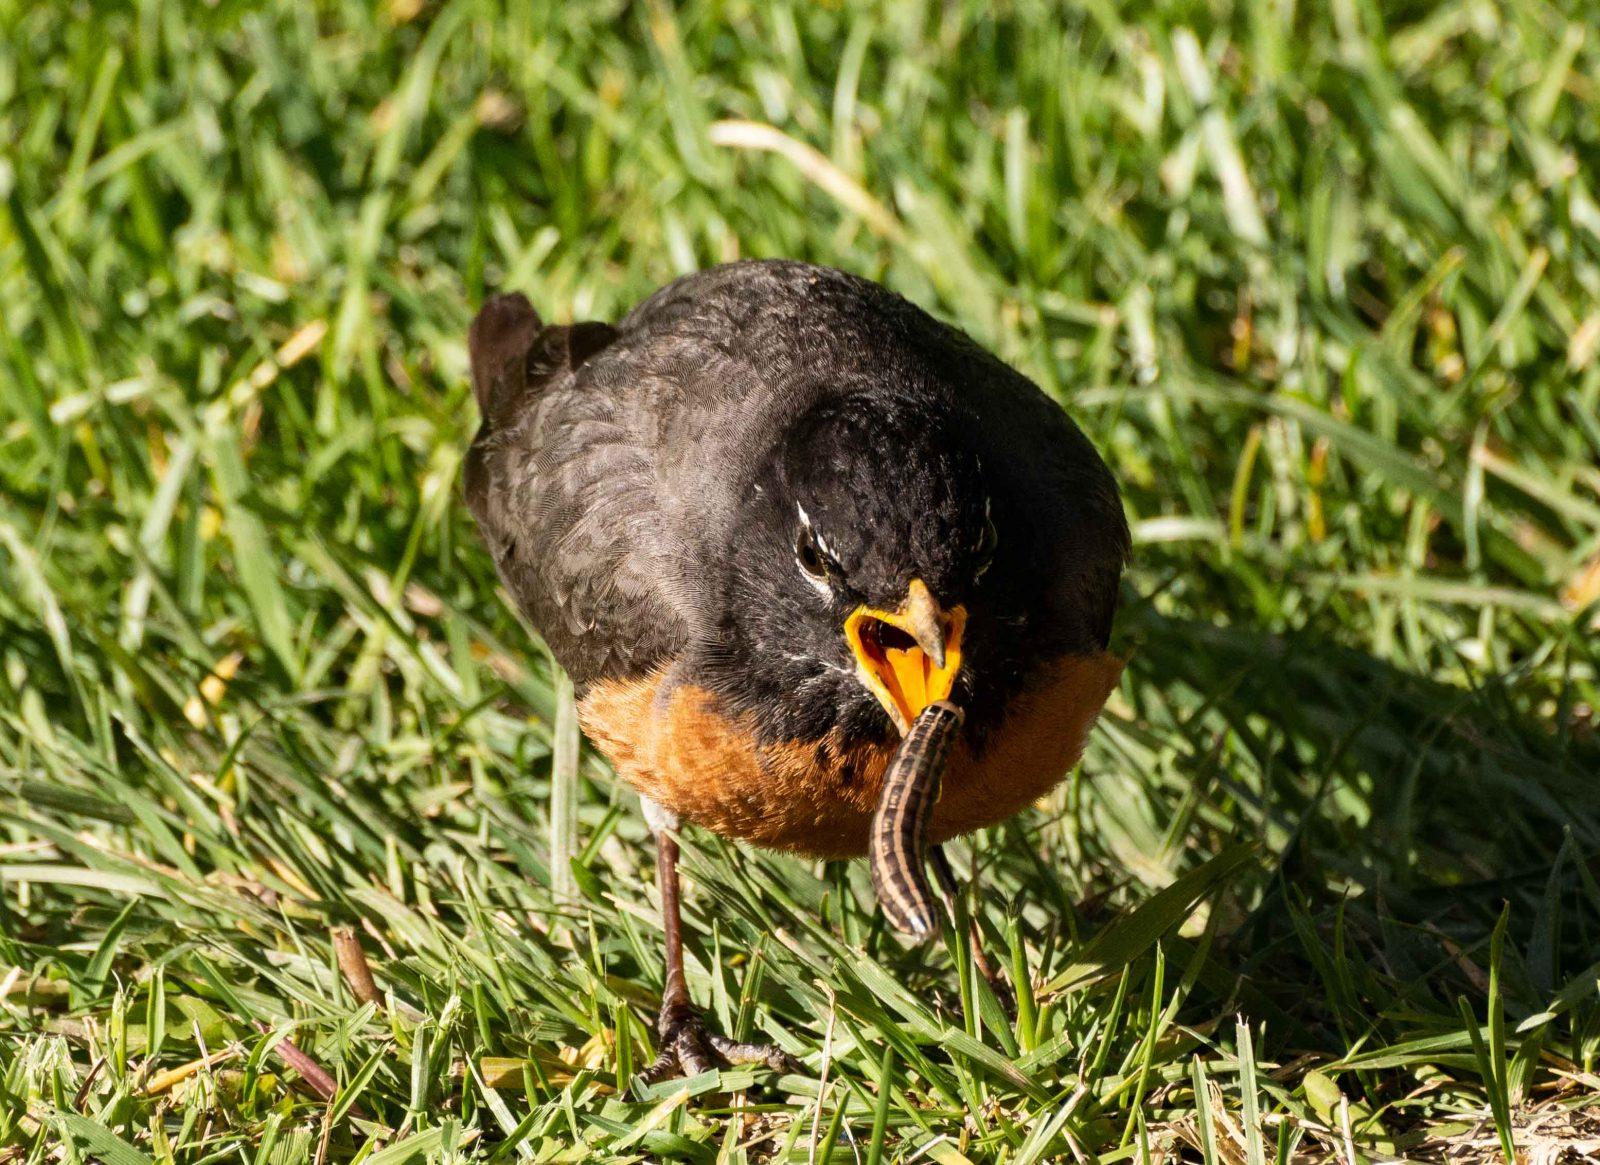 Robin with Cutoworm